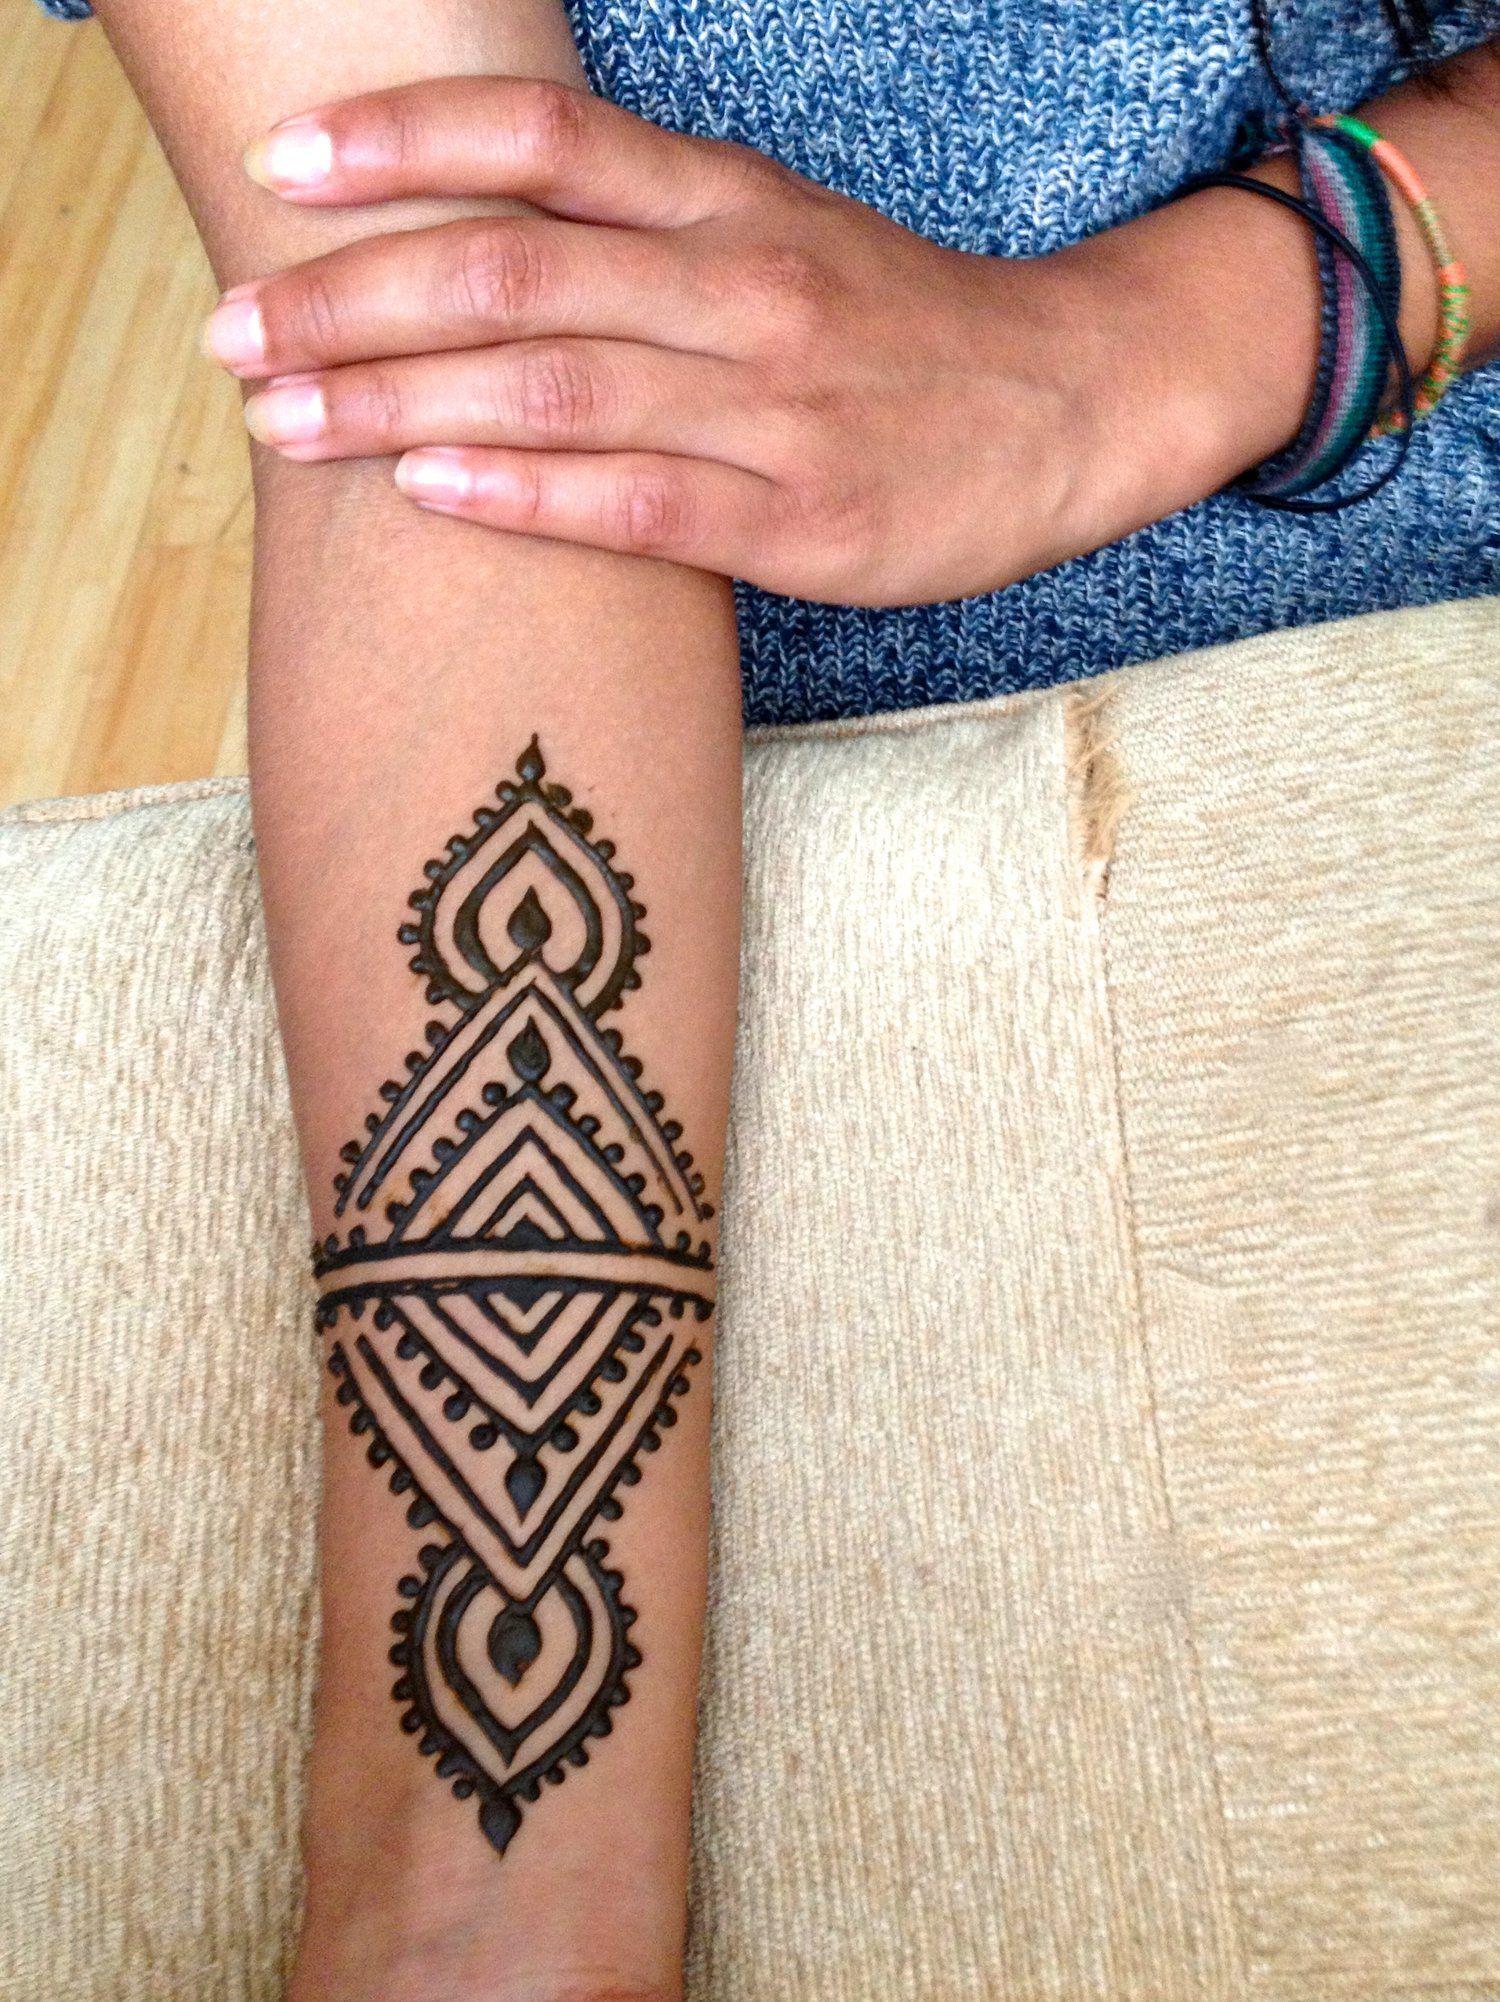 Pin By Karalee Nelson On Henna Henna Tattoo Designs Tribal Henna Designs Henna Tattoo Hand